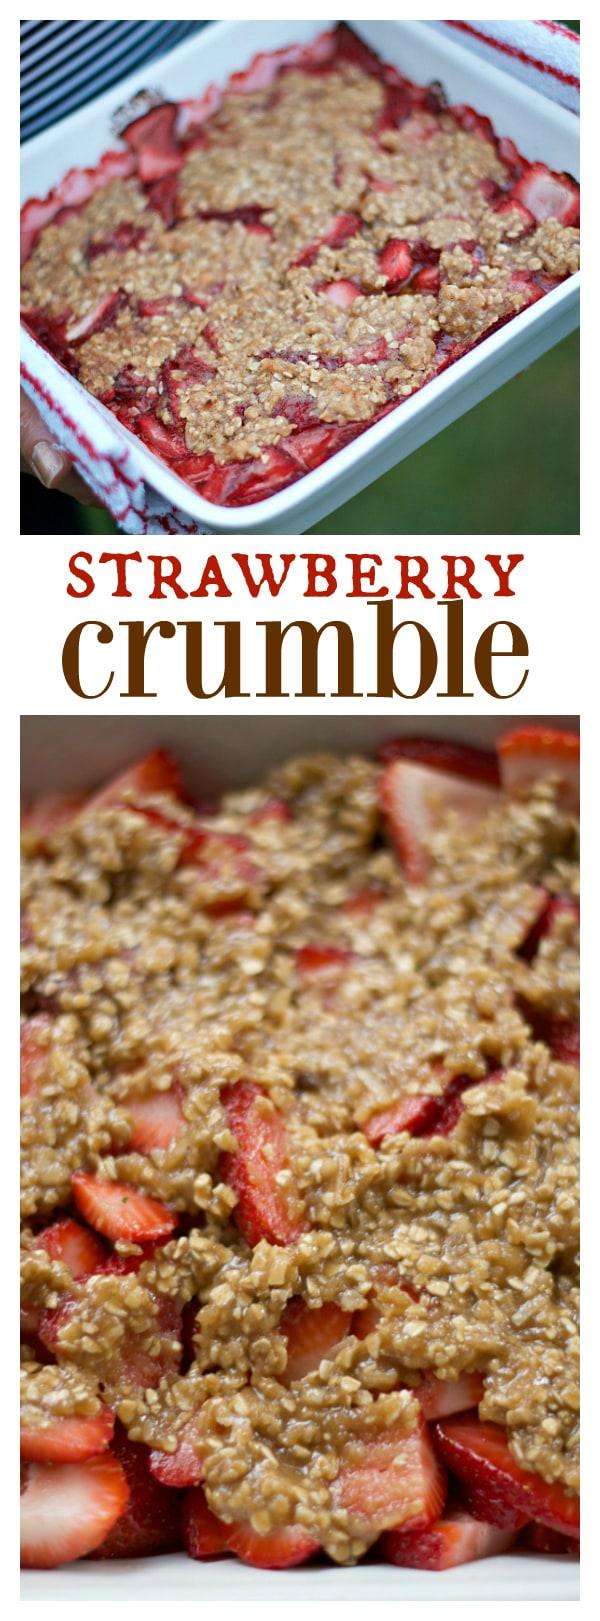 Strawberry Crumble Dessert